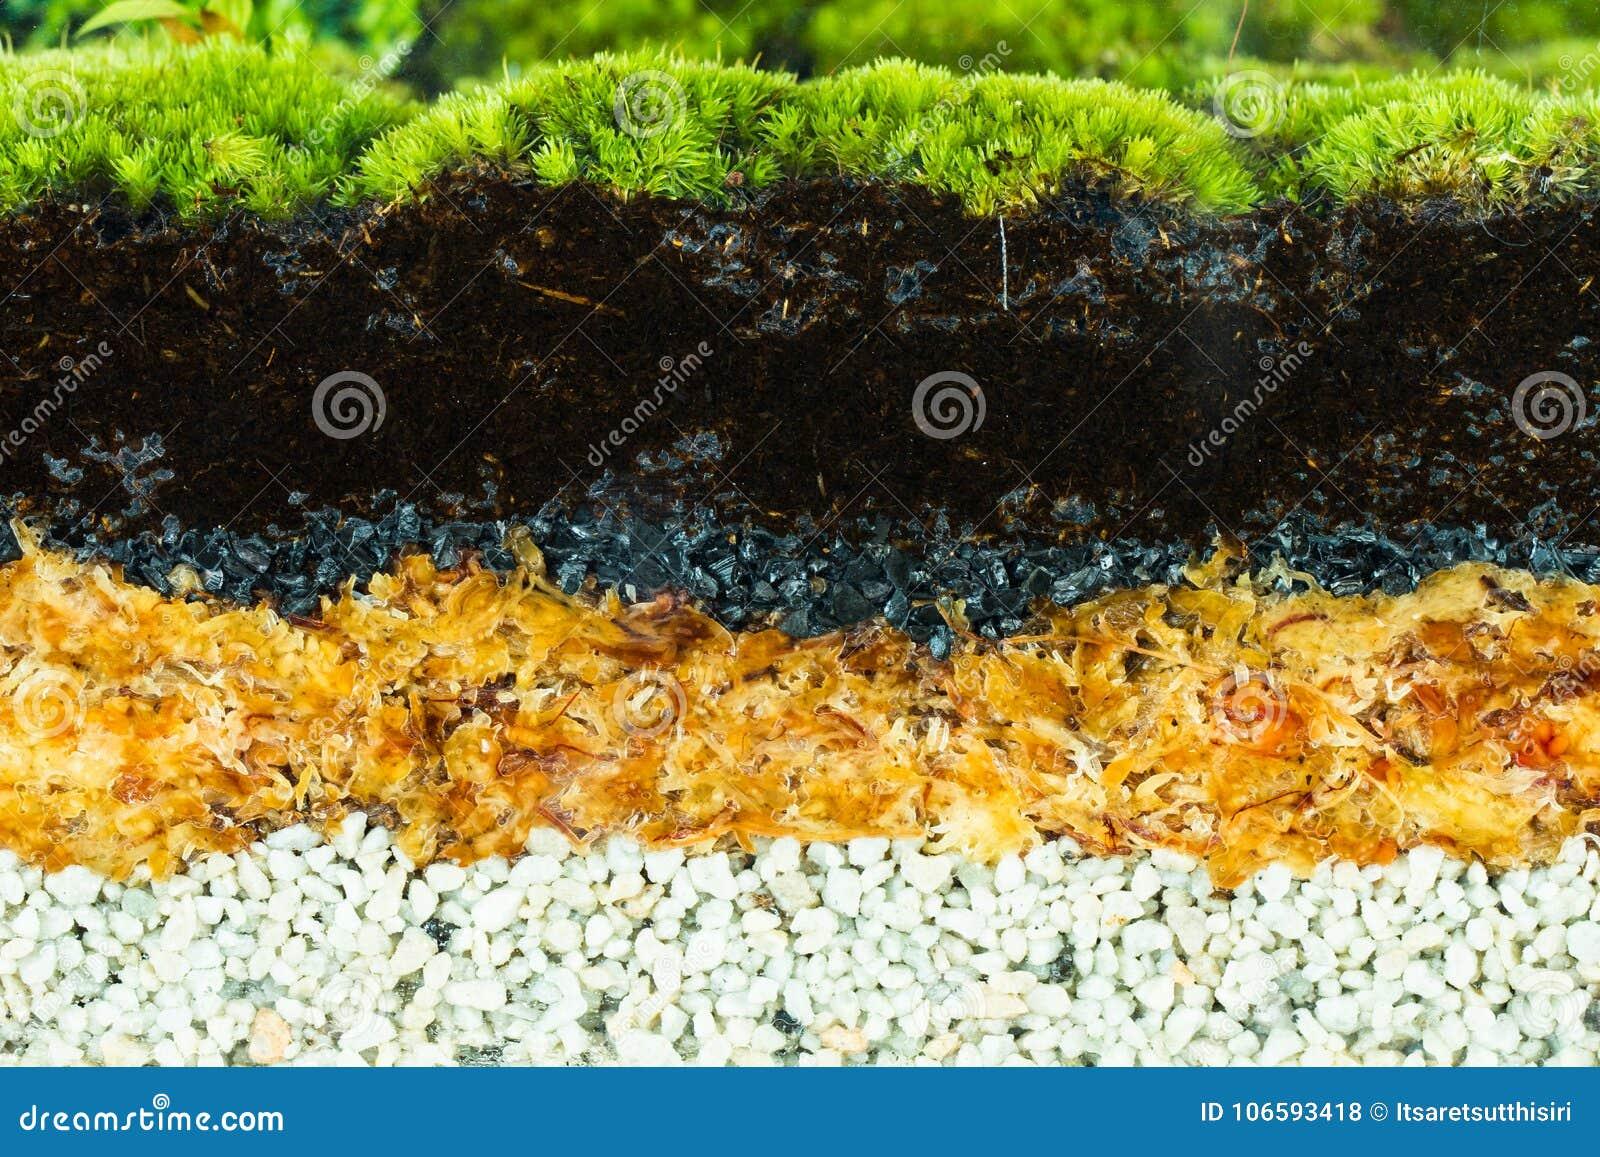 Layers Of Terrarium Stock Photo Image Of Garden Drawn 106593418